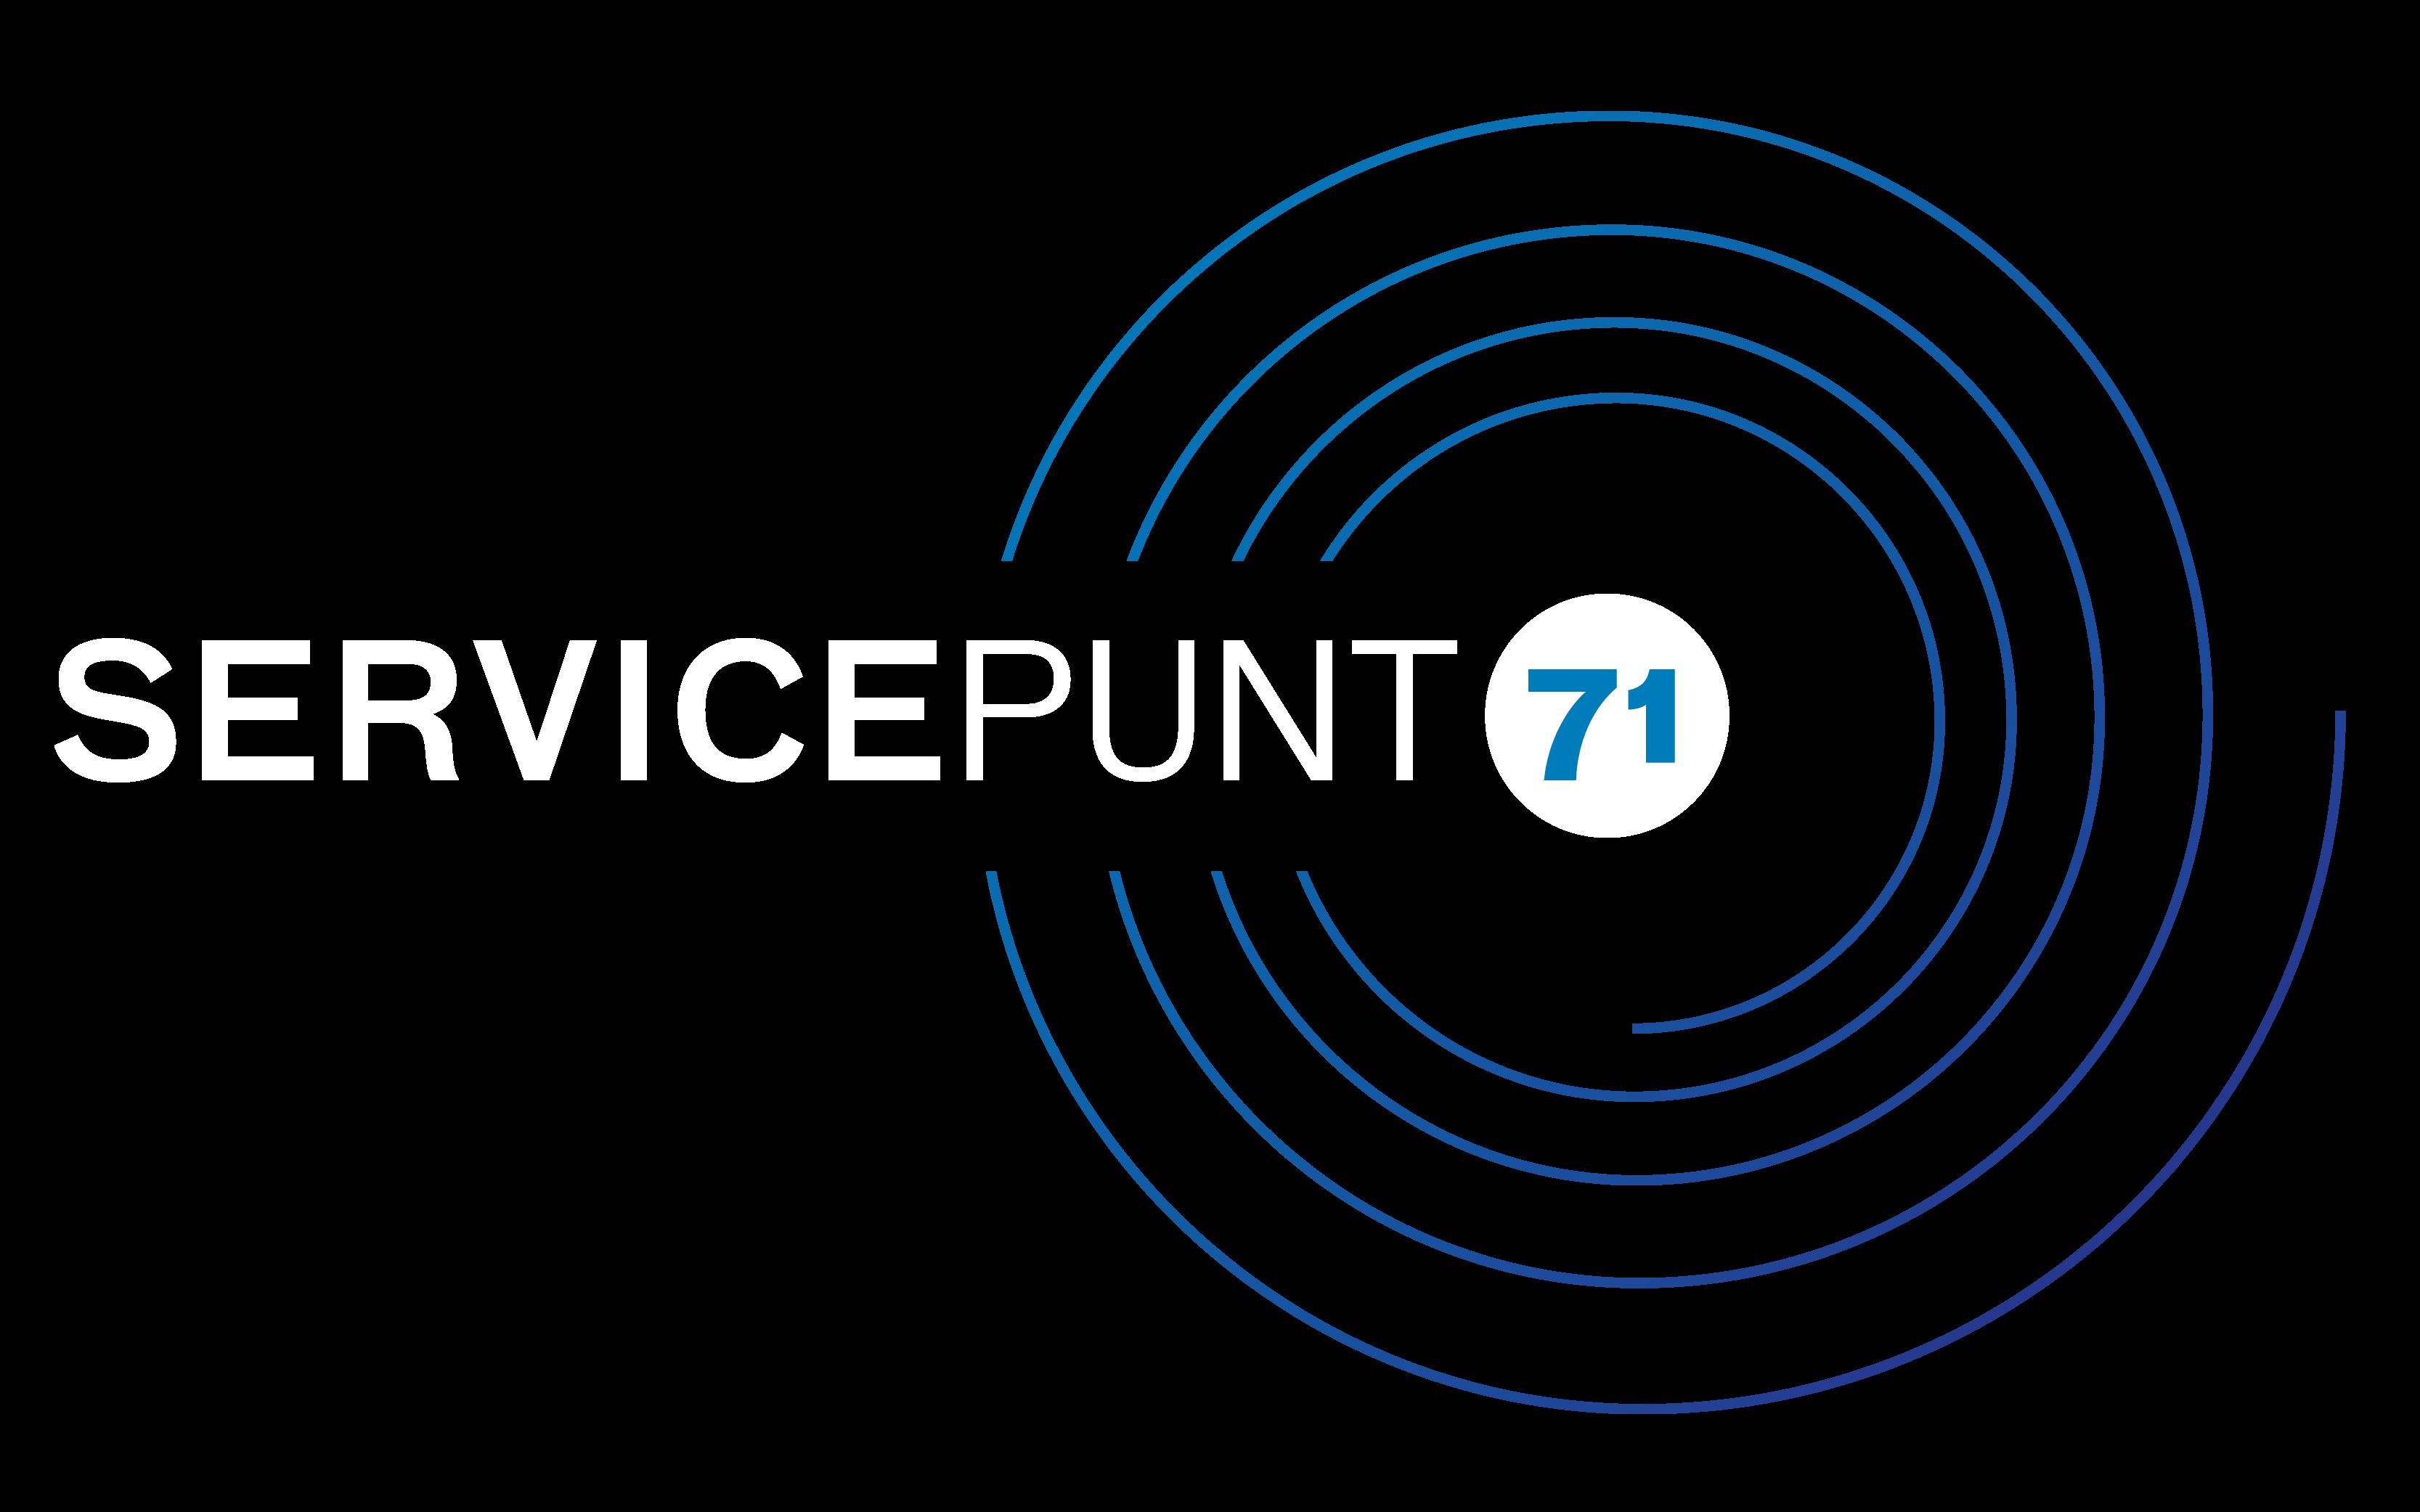 logo-servicepunt71